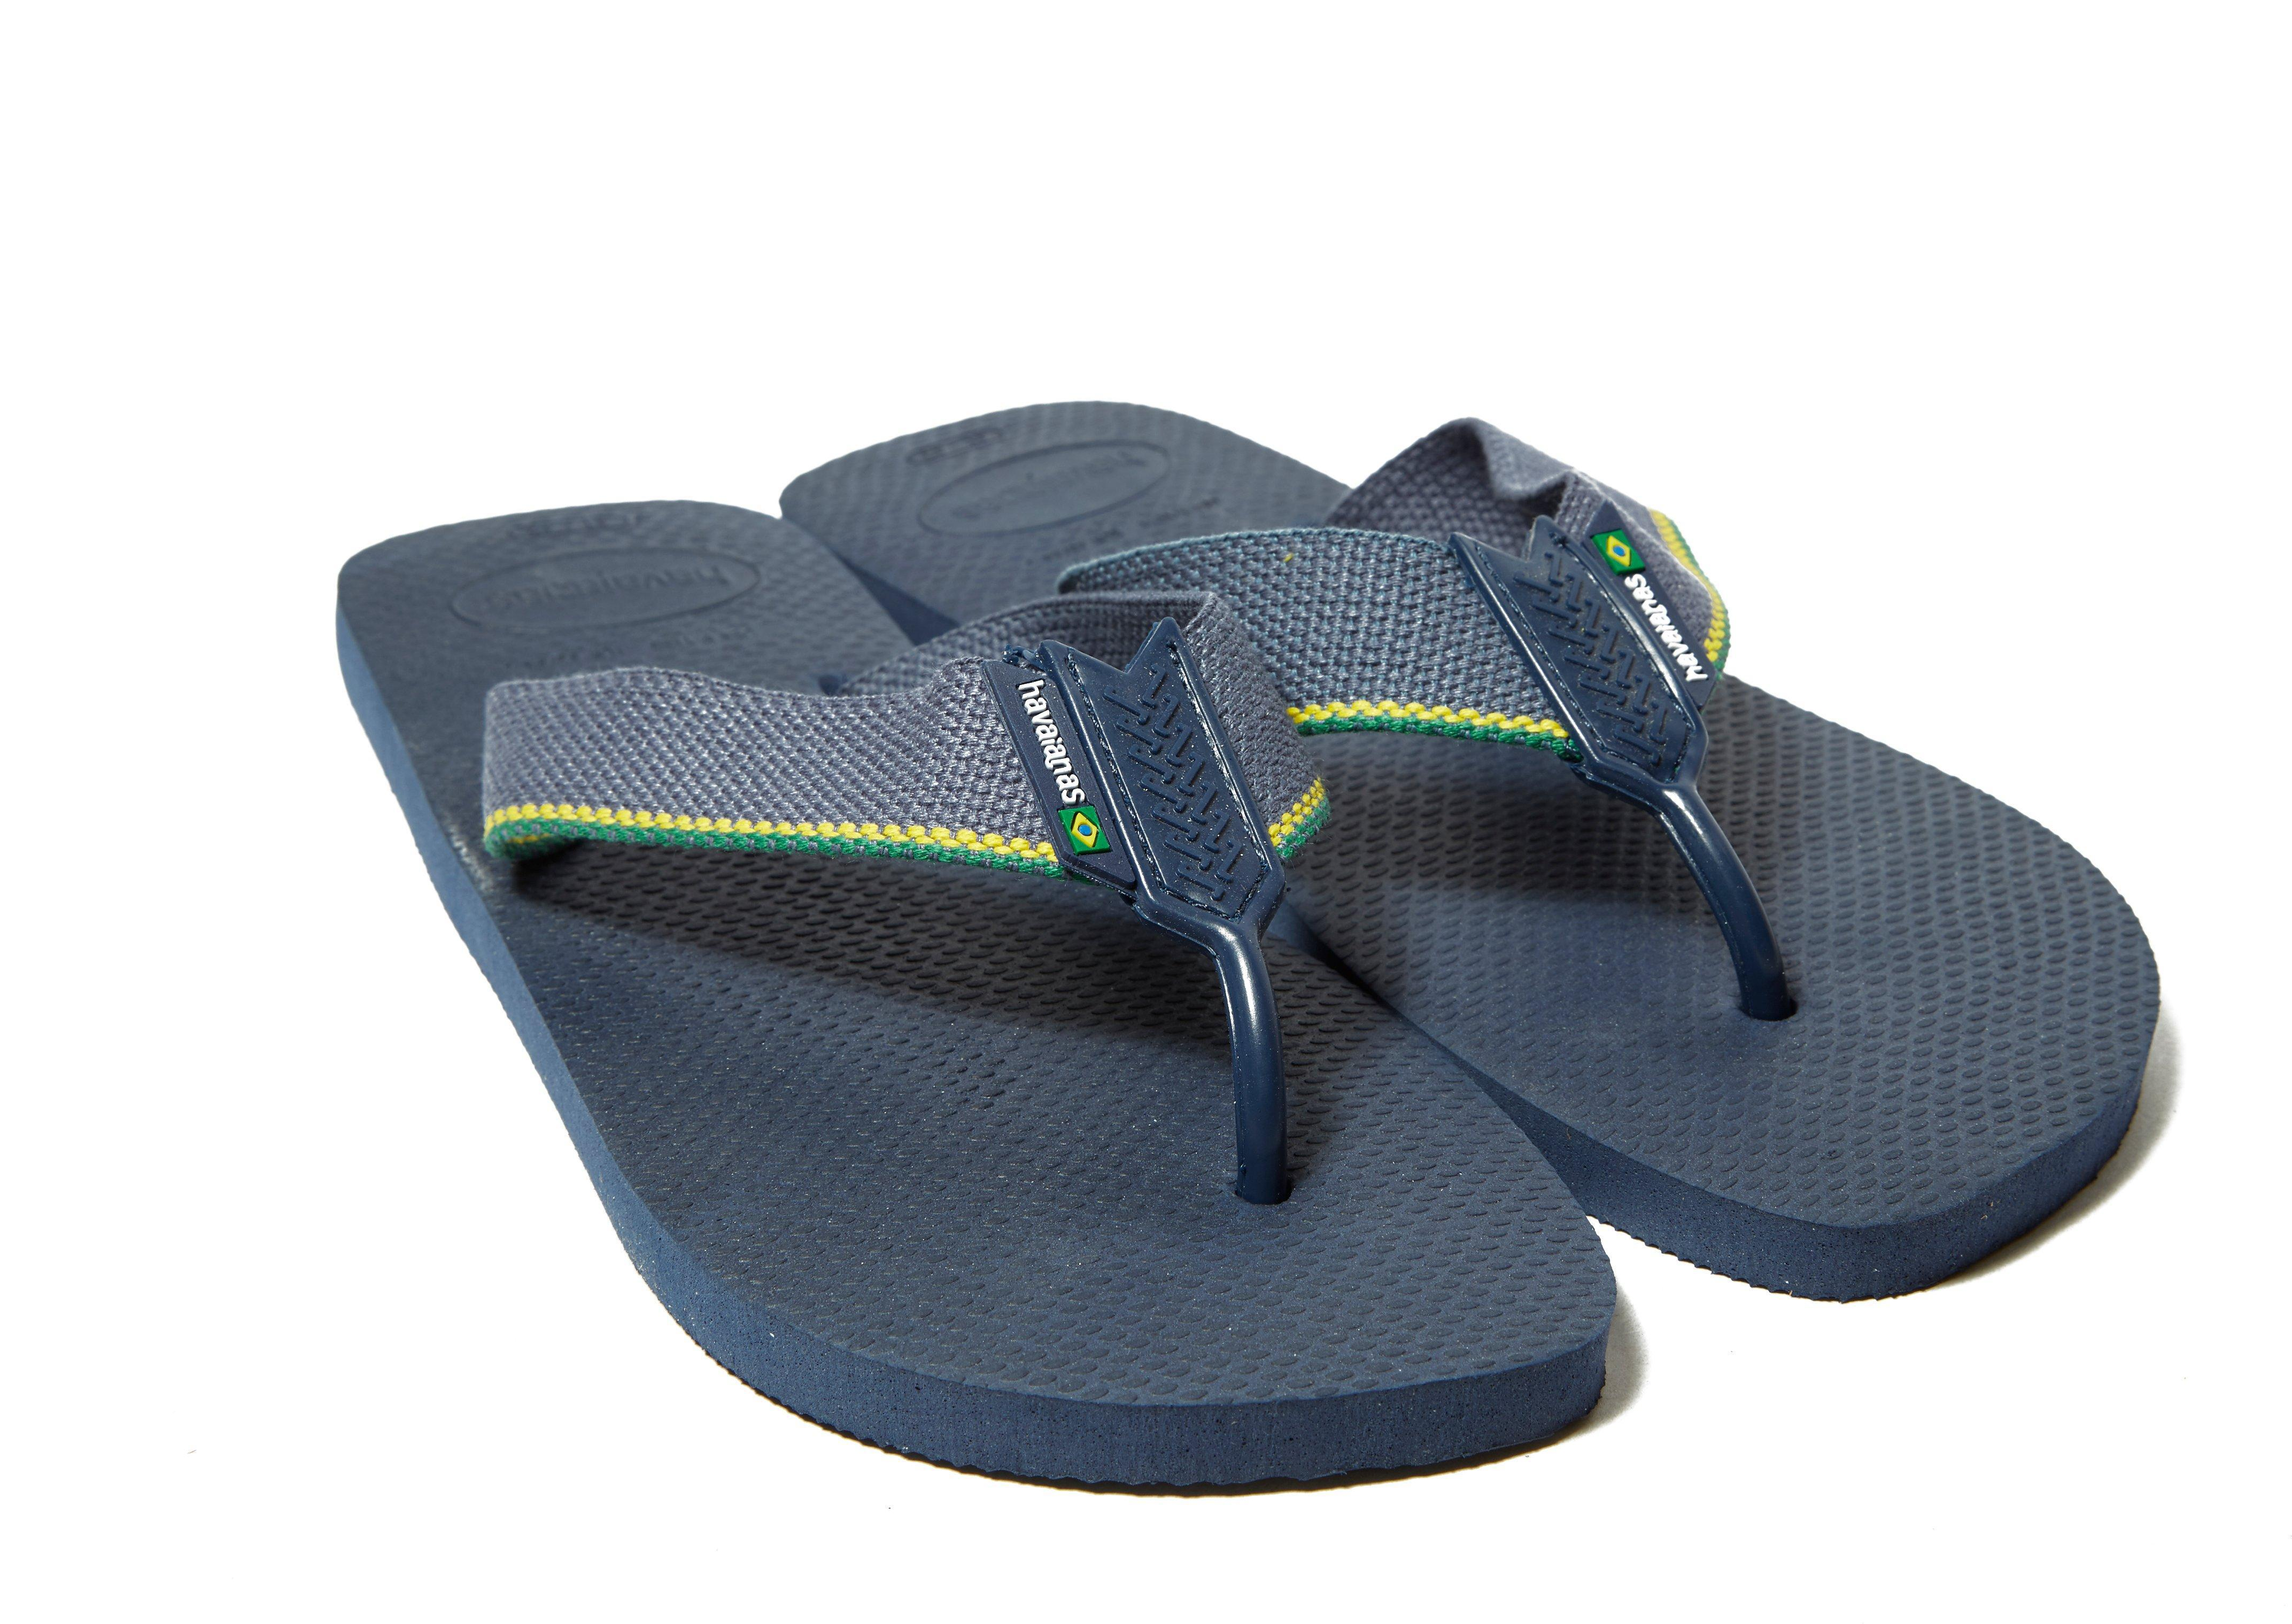 07231b7da51c7b Havaianas Brazil Logo Urban Sandals in Blue for Men - Save ...